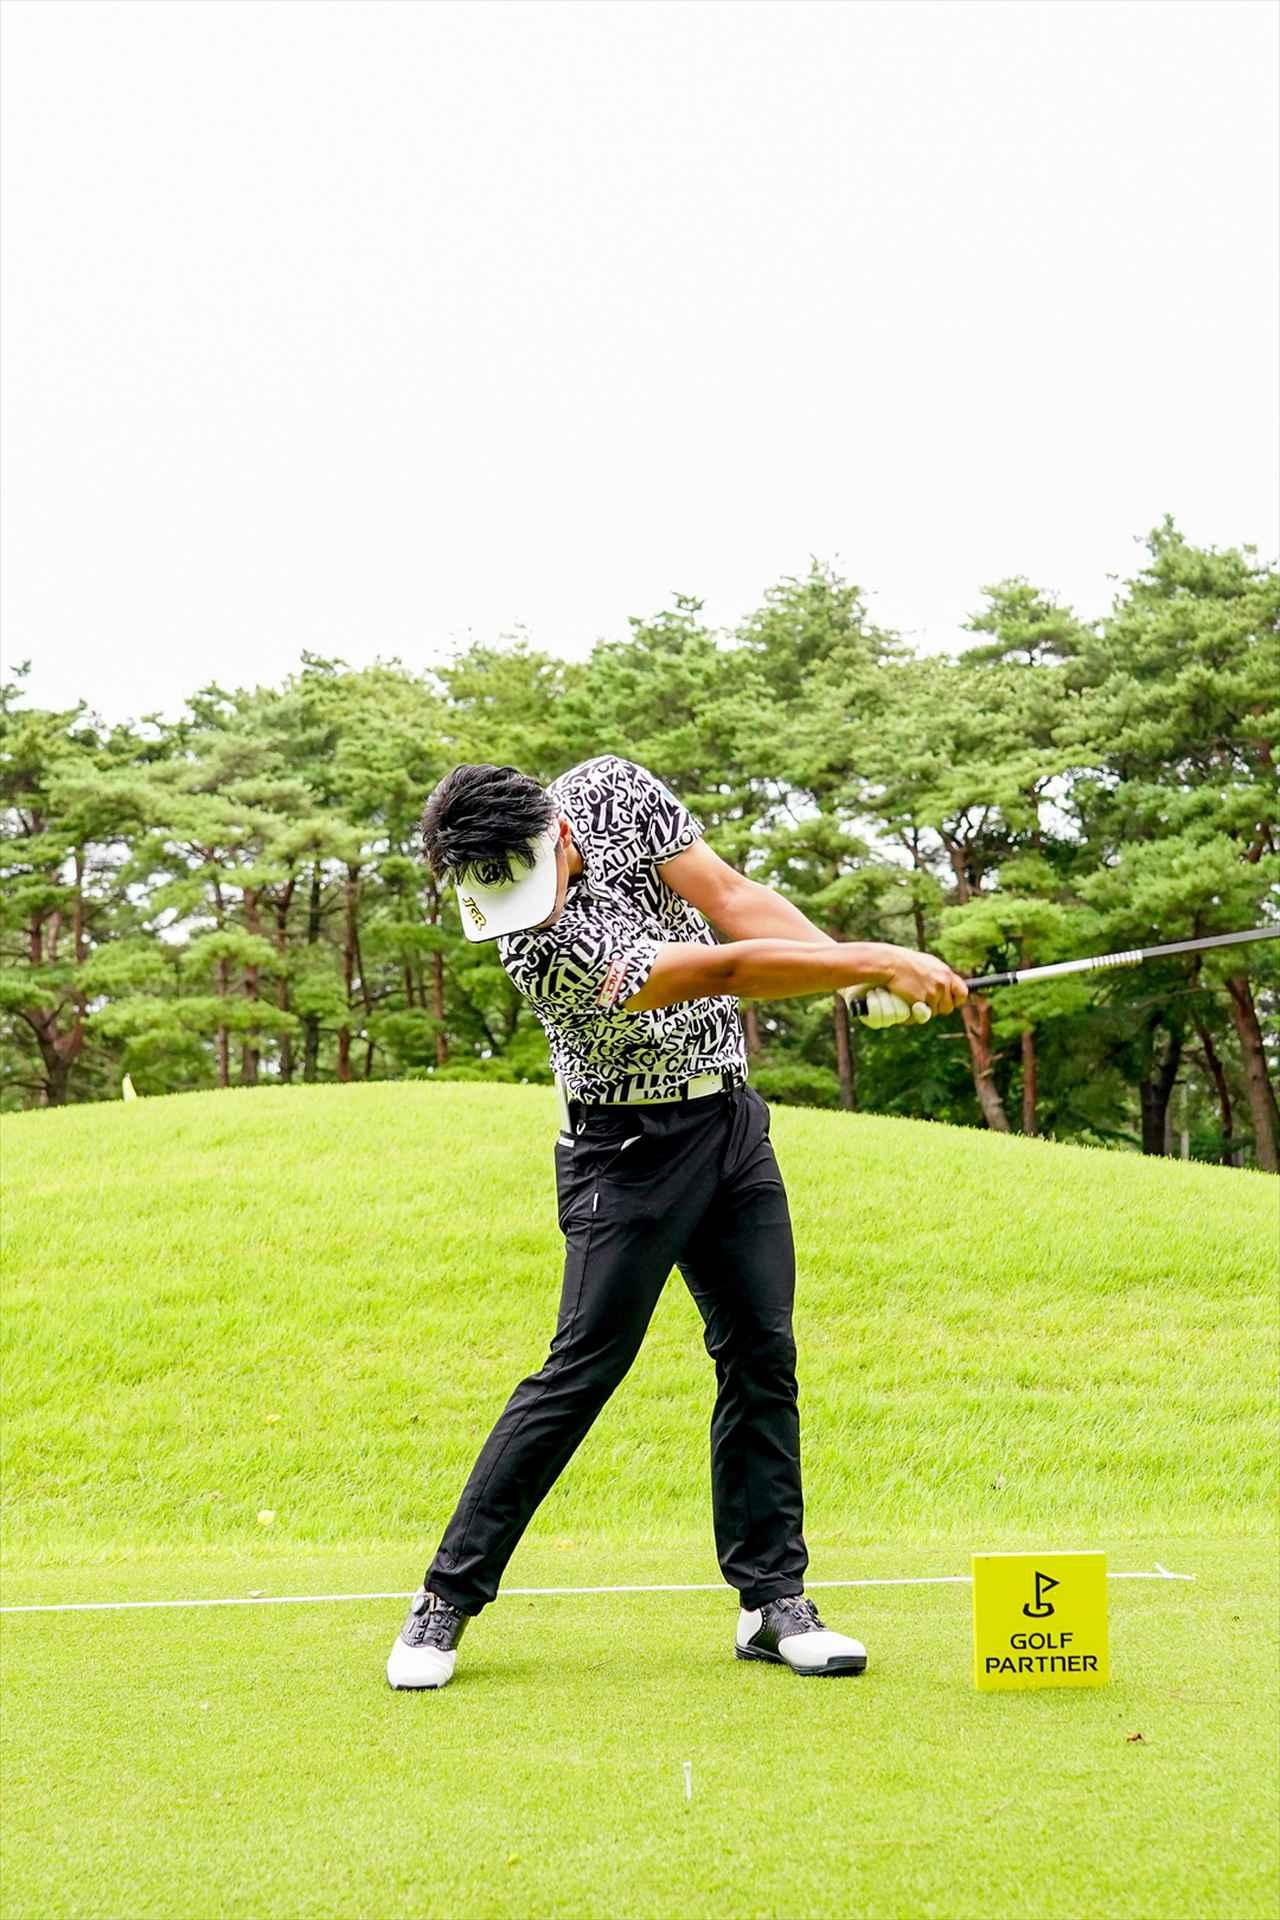 Images : 9番目の画像 - 関藤直煕 ドライバー正面連続写真 - みんなのゴルフダイジェスト